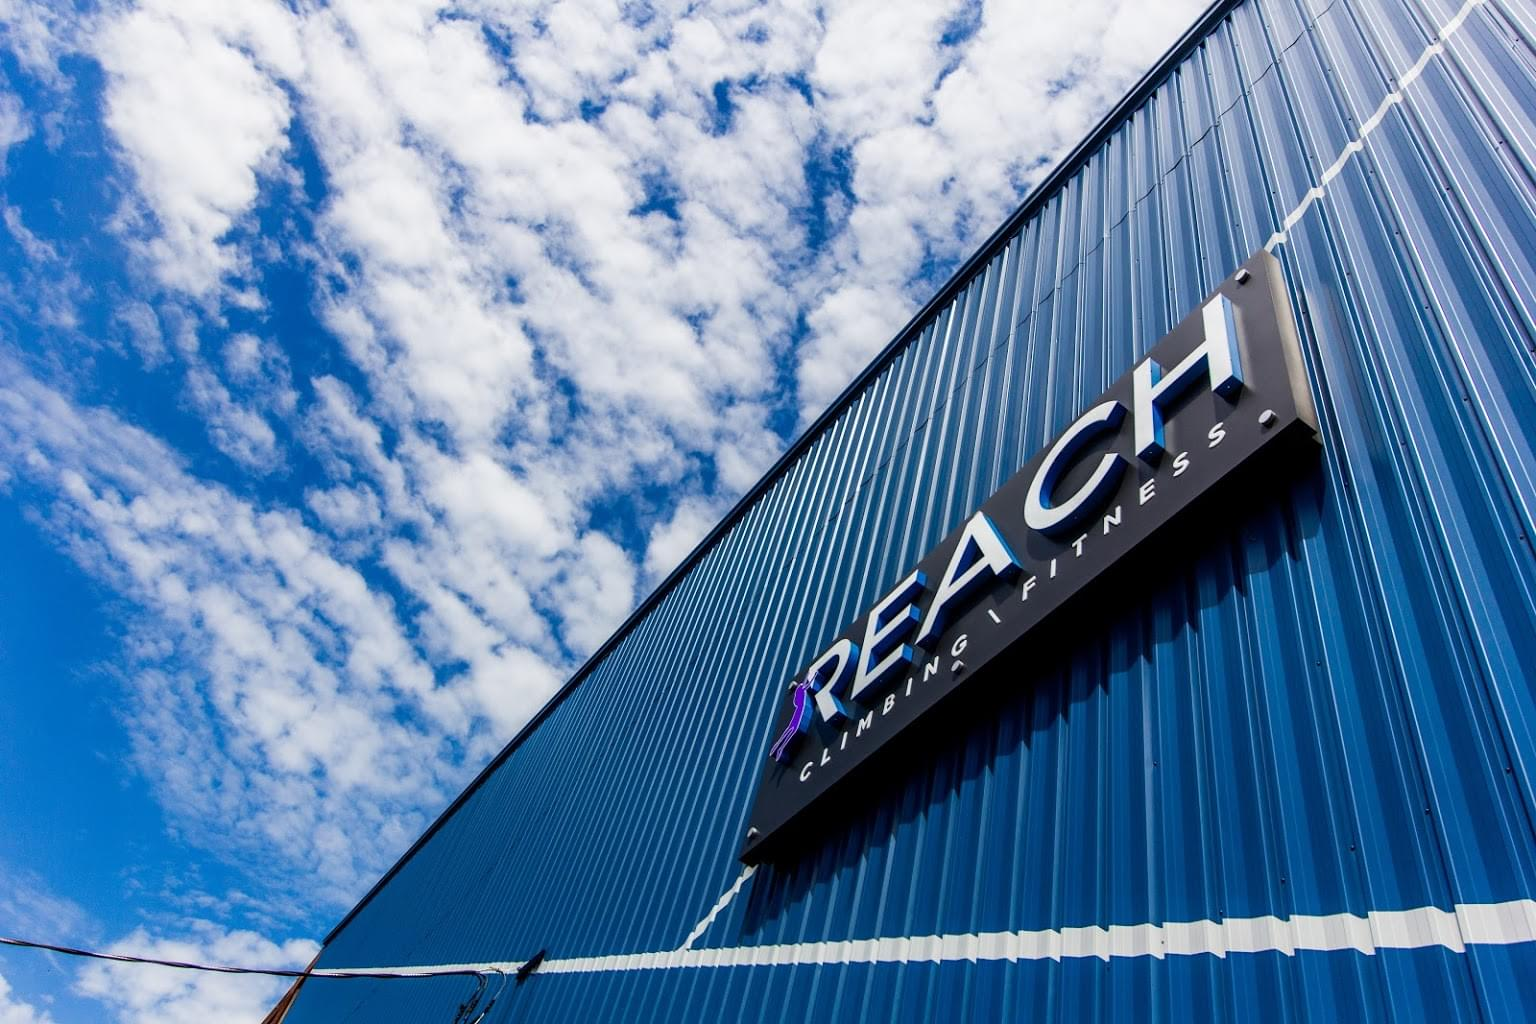 sign Reach Climbing + Fitness rock-climbing gym in Bridgeport, PA